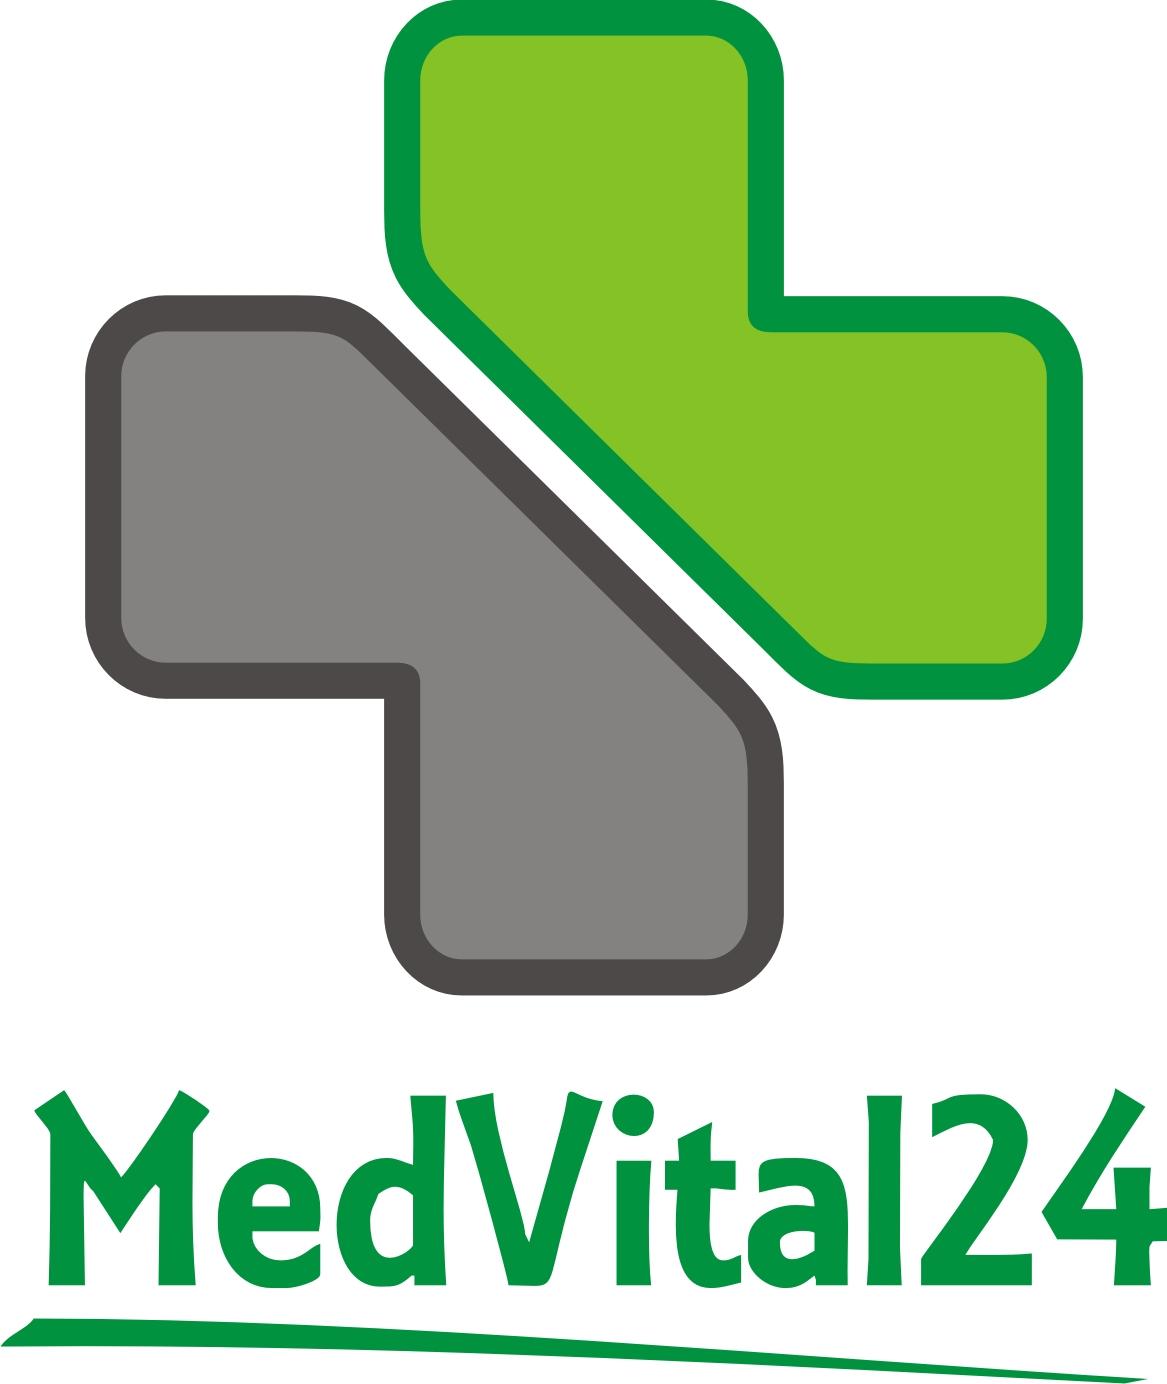 Logo Medvital 24 Nord GmbH